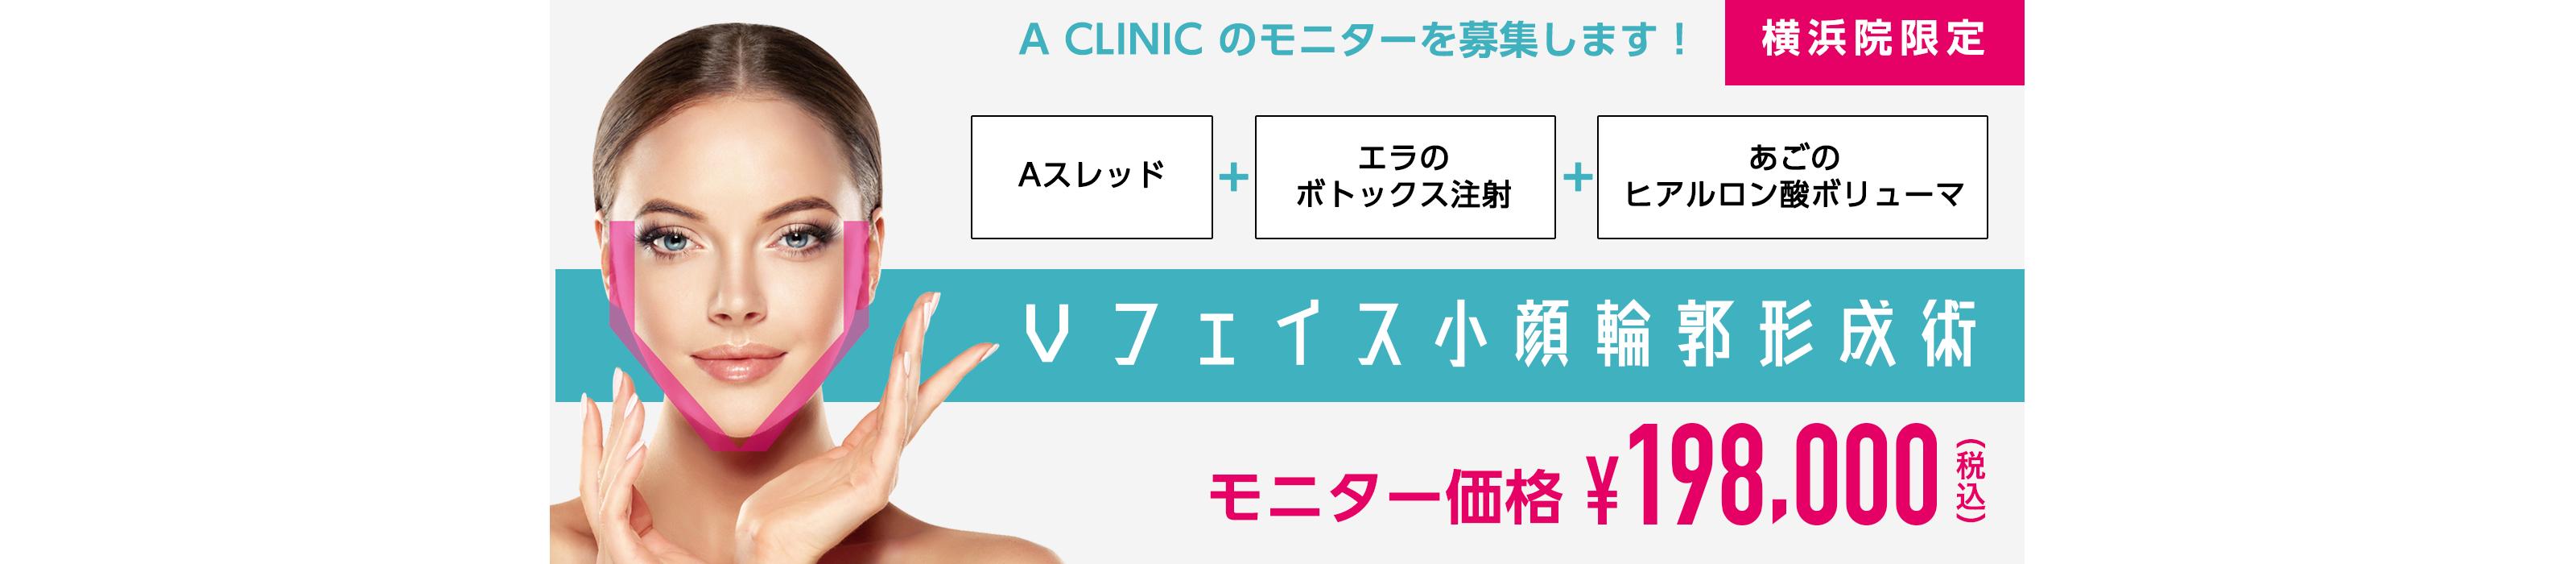 【A CLINIC 横浜院限定】モニター募集〜Vフェイス小顔輪郭形成術〜